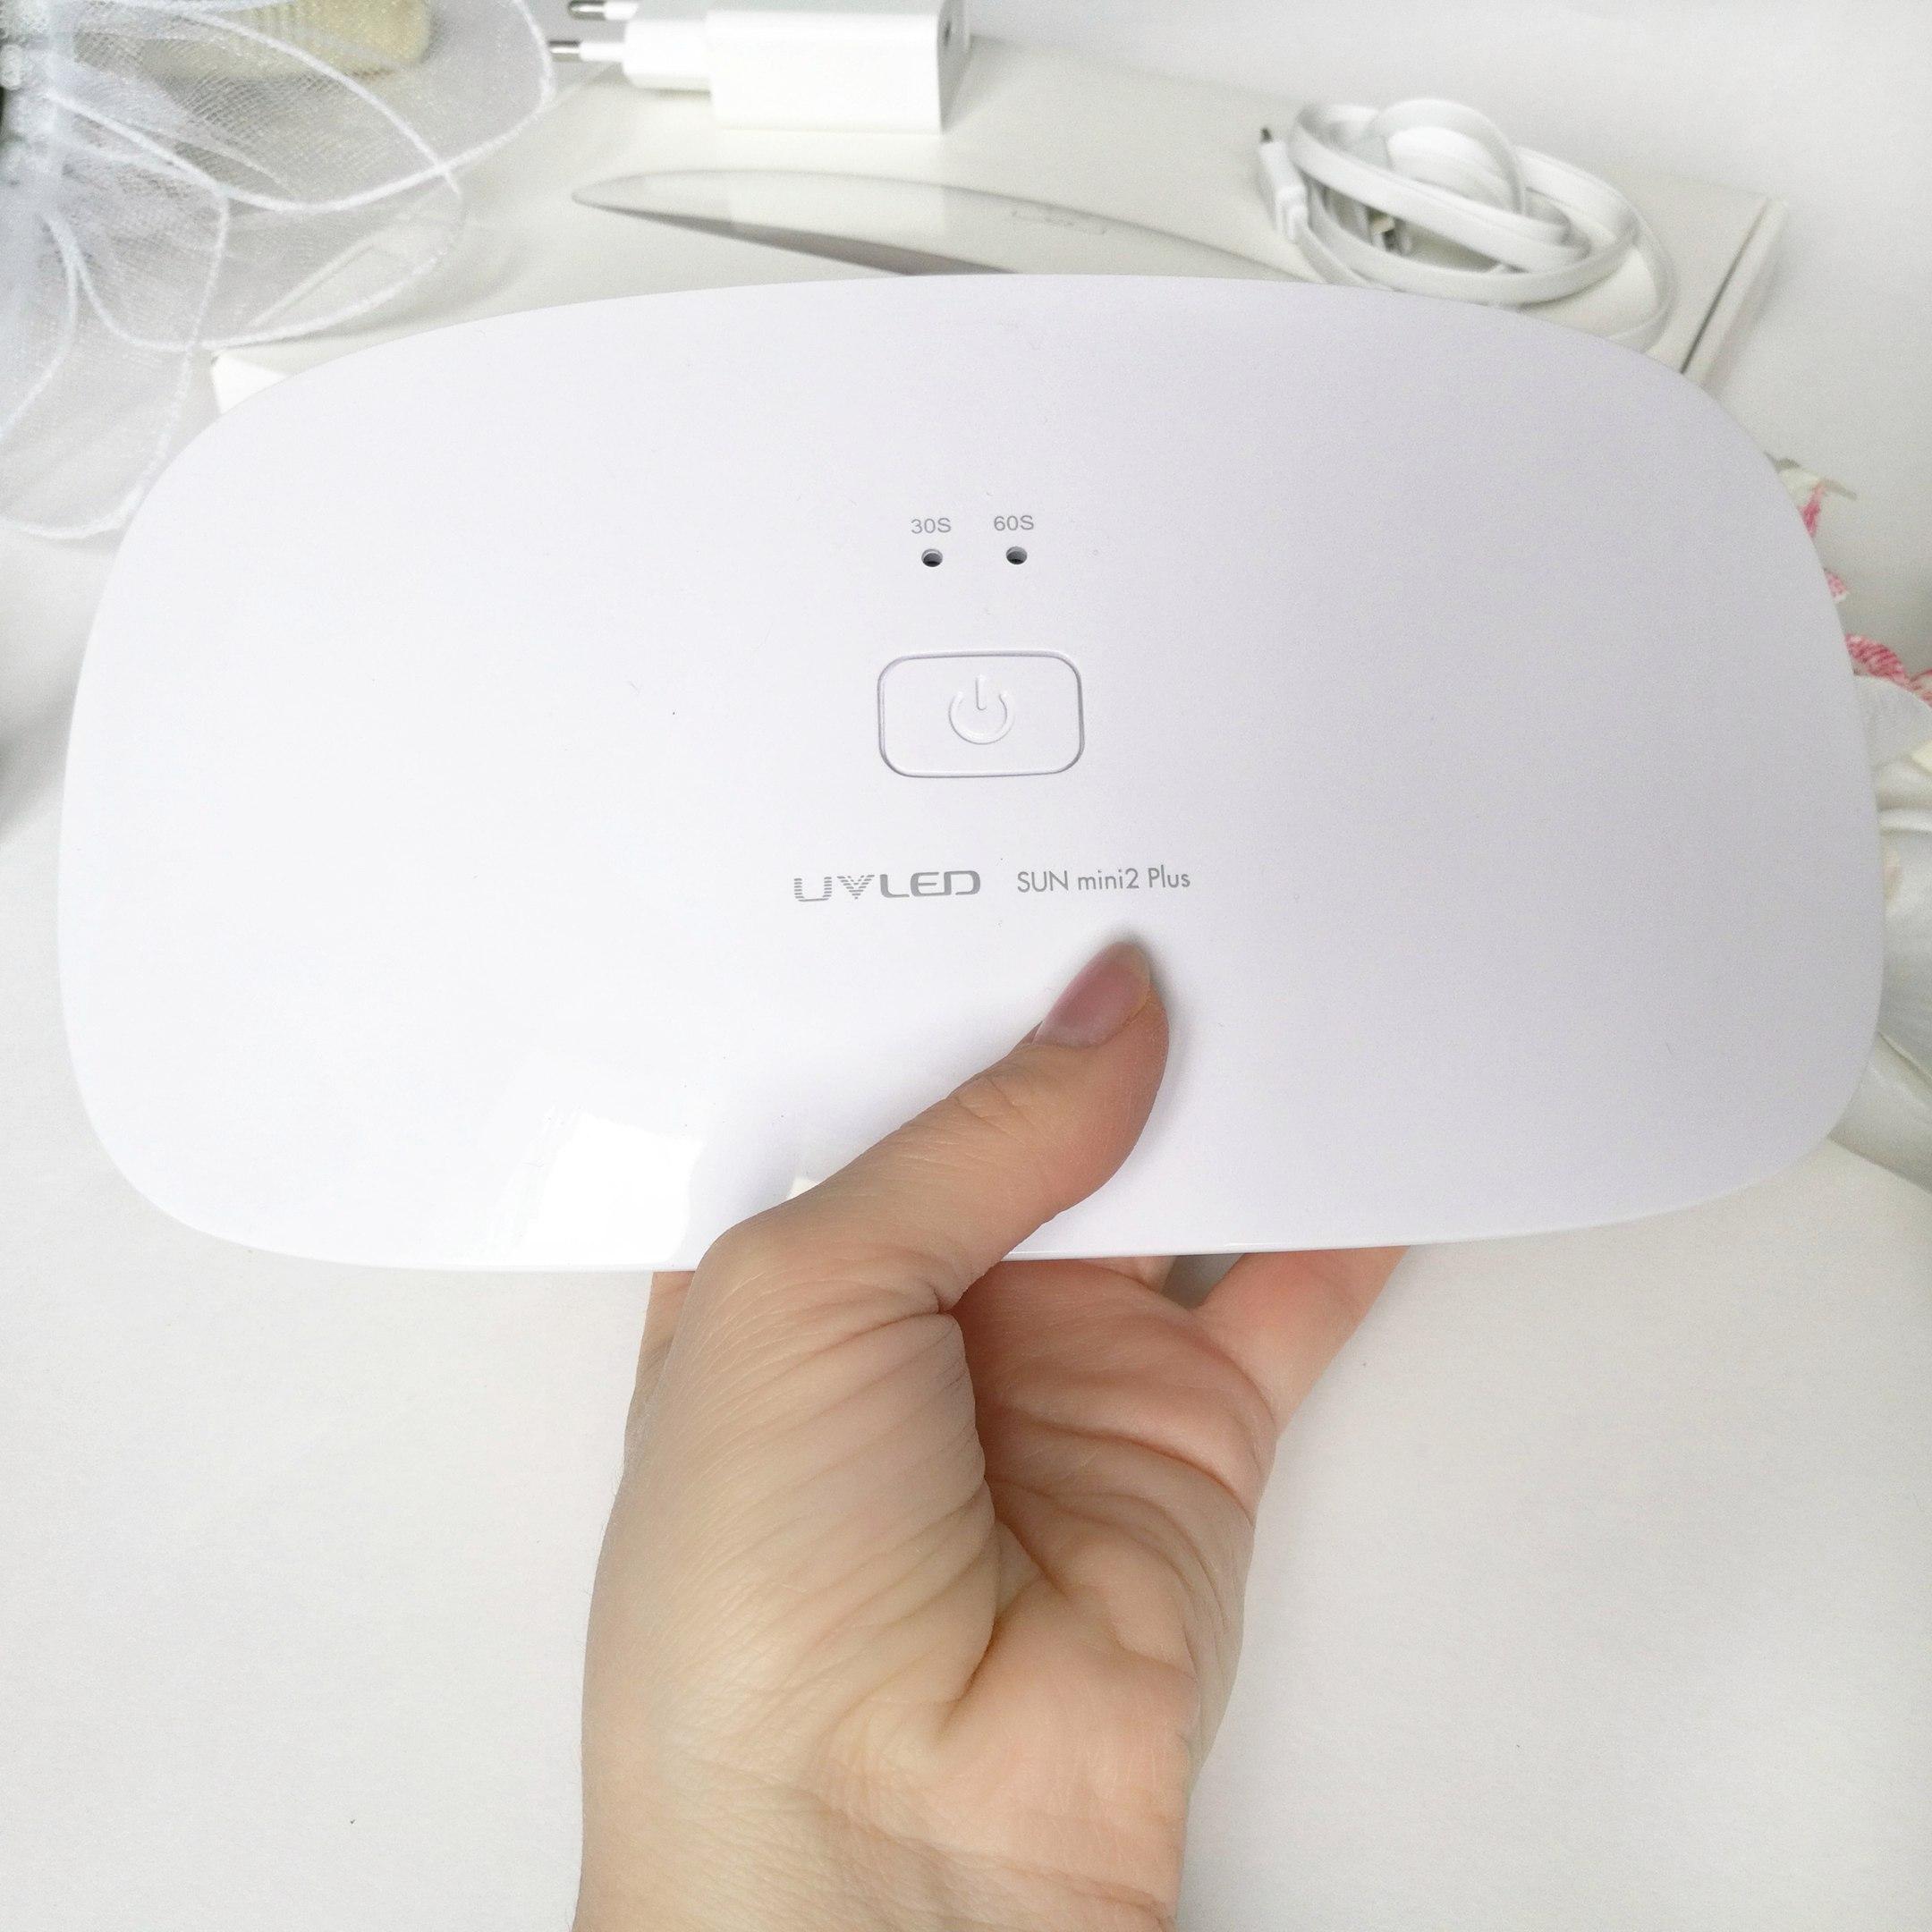 UVLED лампа SUN mini2 Plus из очень популярного магазина SUNUV Official Store